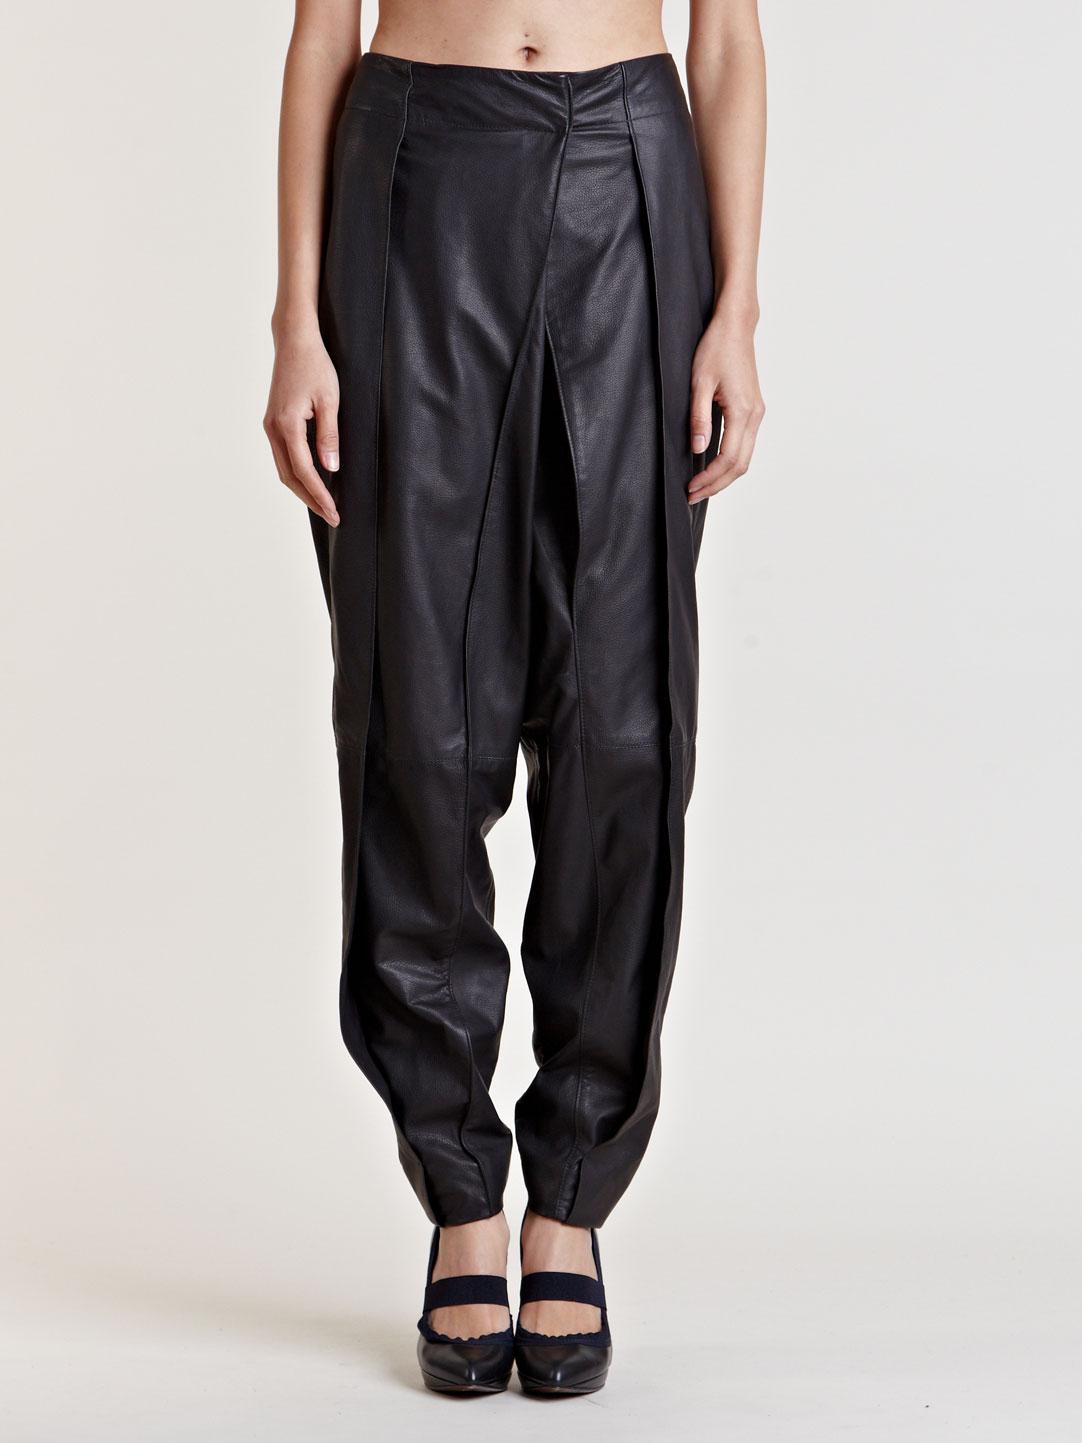 06123fdb21d Lanvin Womens Leather Trousers in Black - Lyst